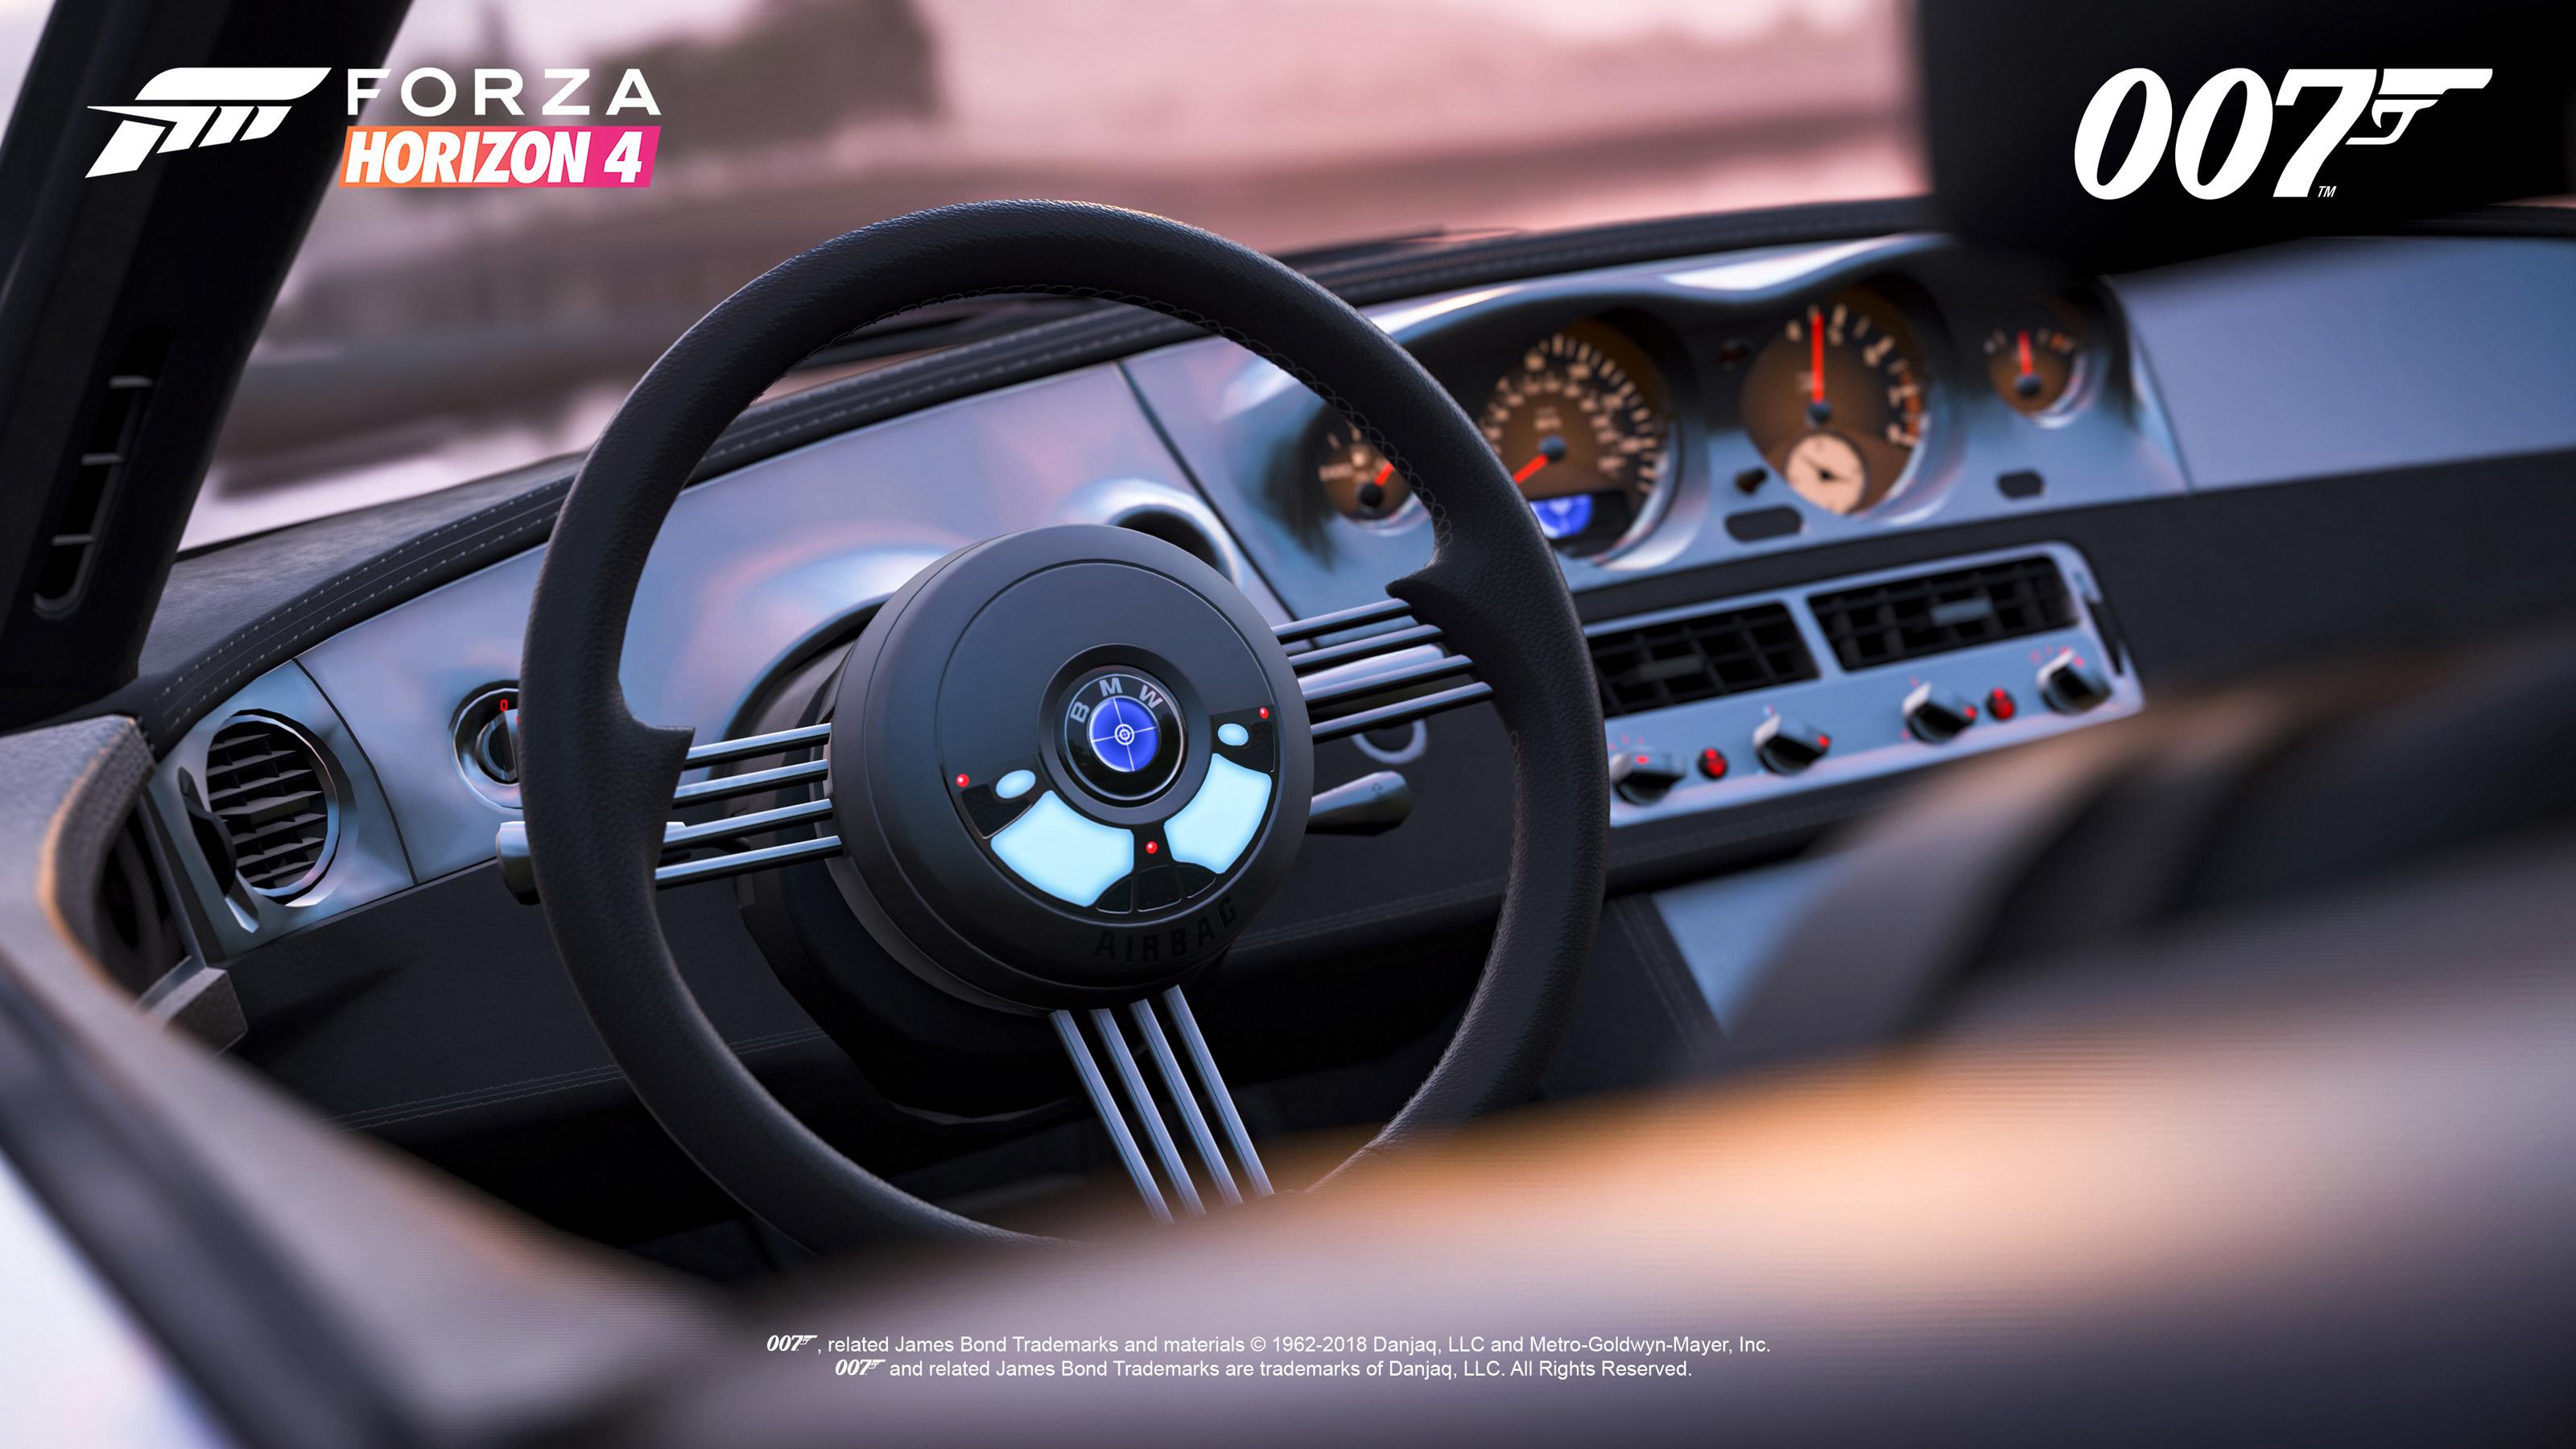 Forza Horizon 4 Wallpaper in 1600x900